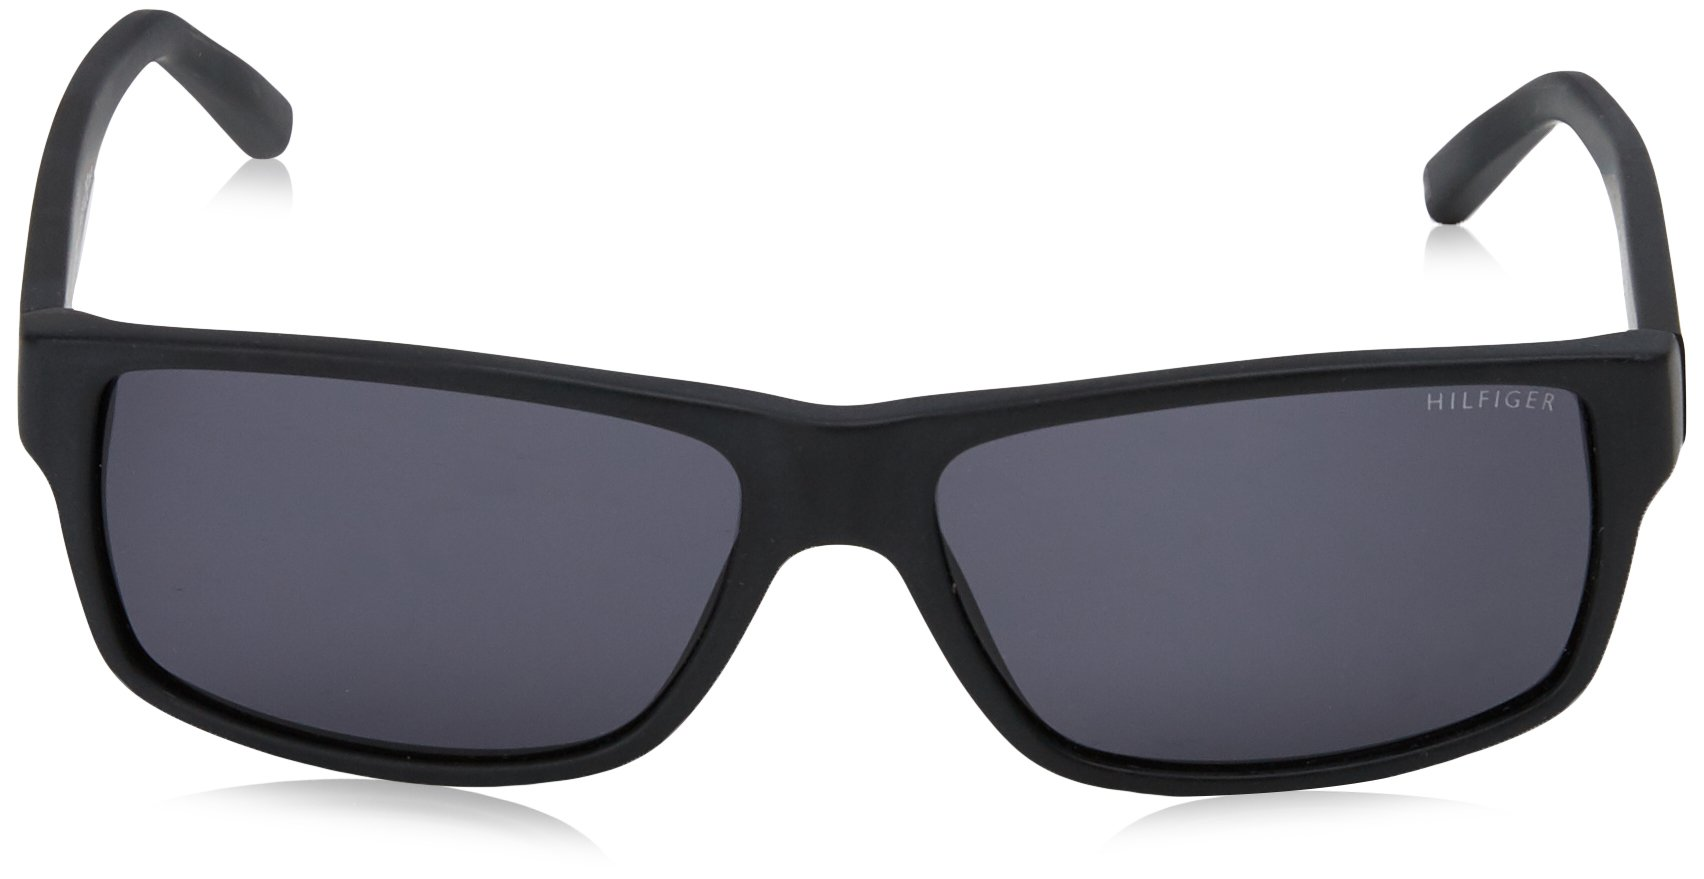 Tommy Hilfiger Sonnenbrille (TH 1042/N/S)